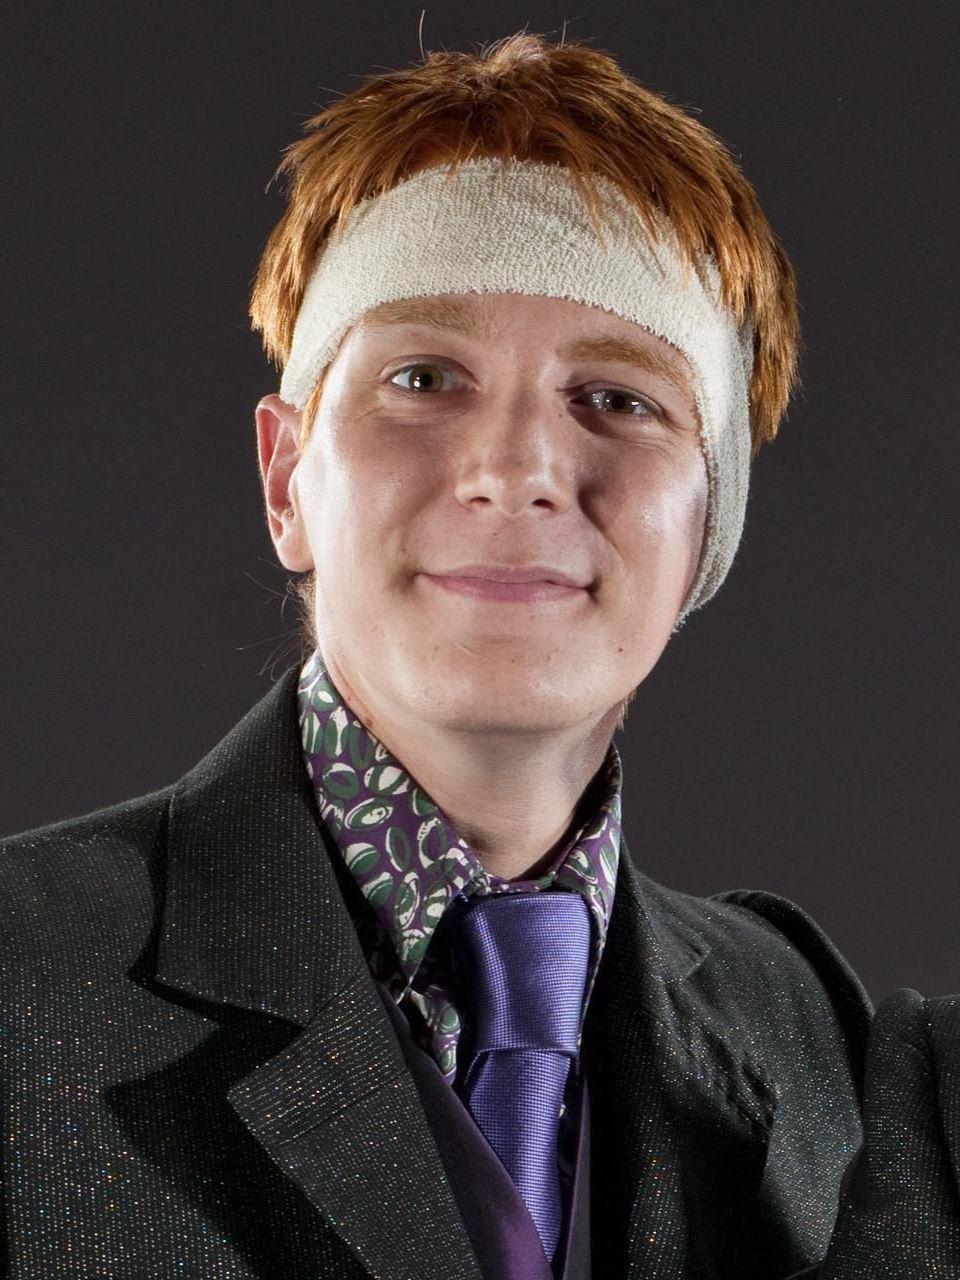 George Weasley | Harry Potter Wiki | FANDOM powered by Wikia